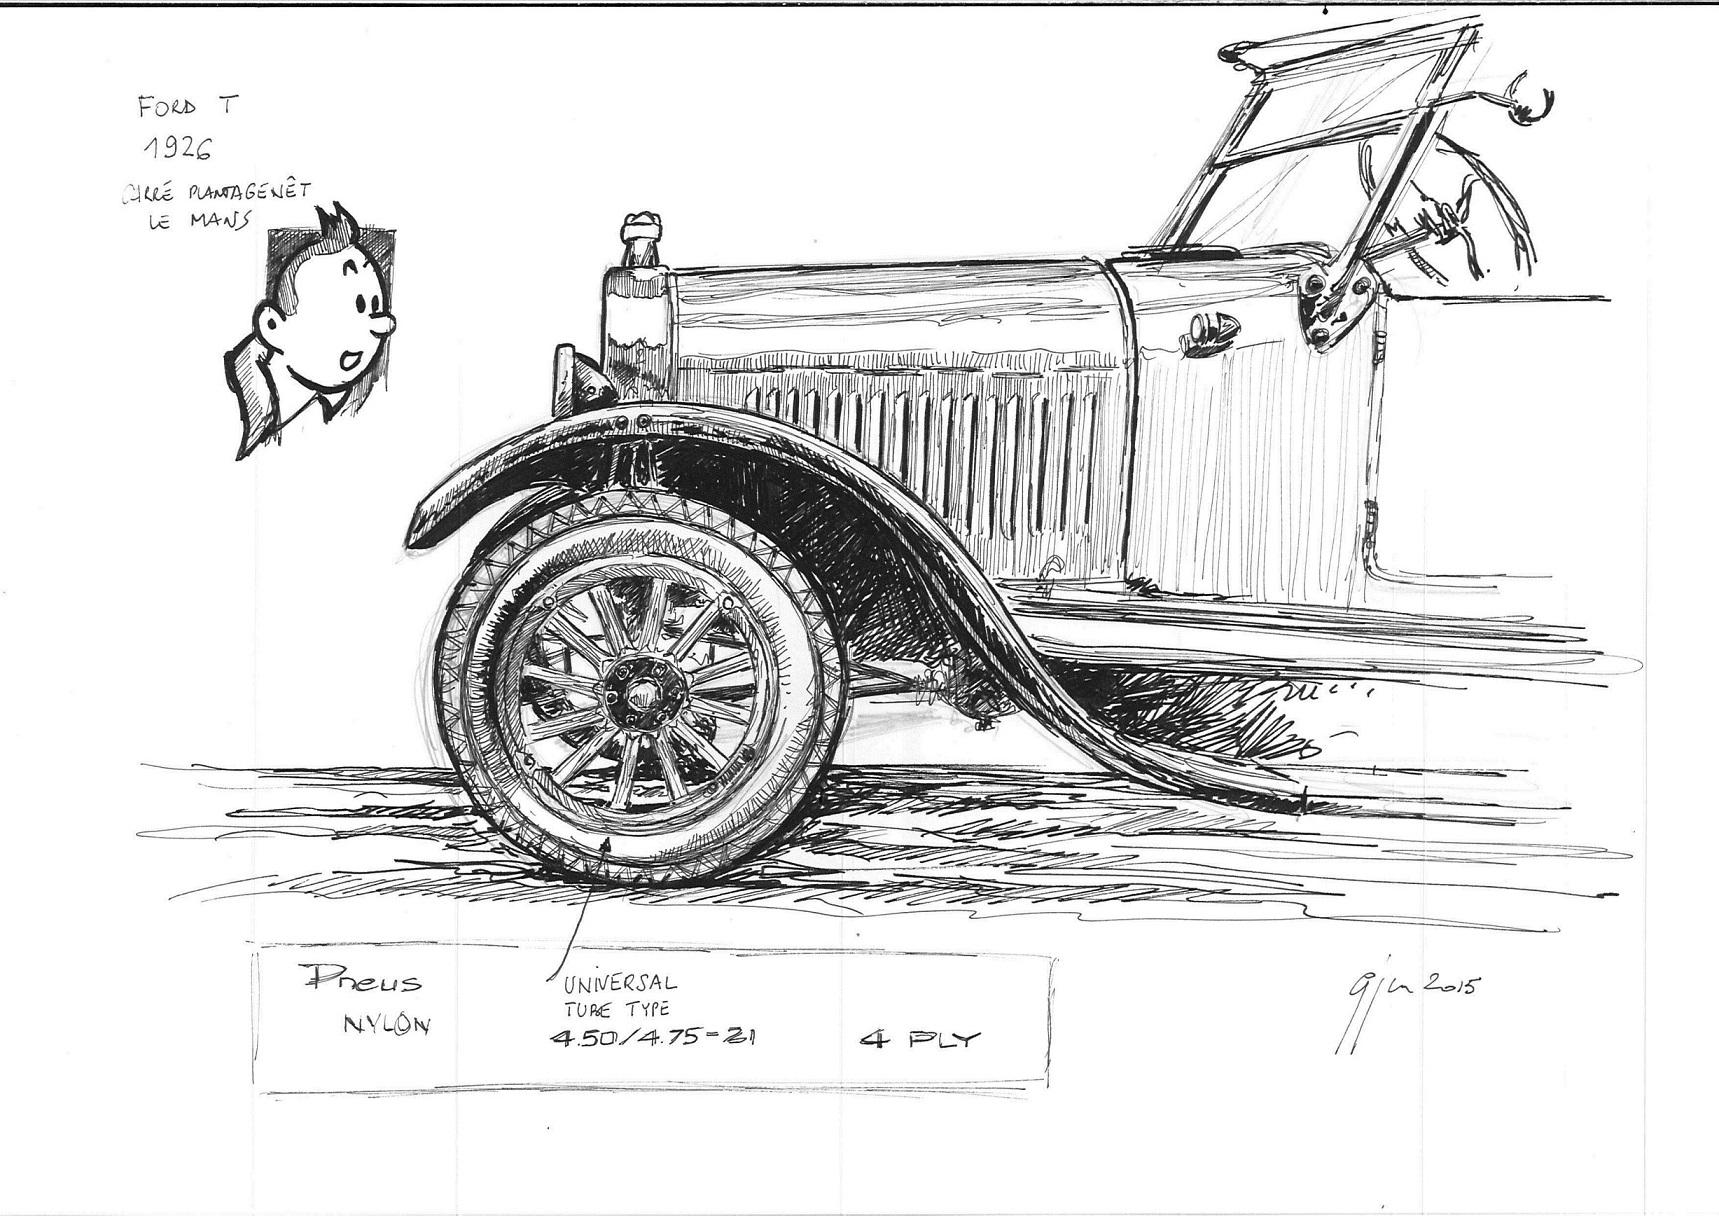 Association normande de v hicules anciens anve la ford t en mod le - Modele dessin voiture ...